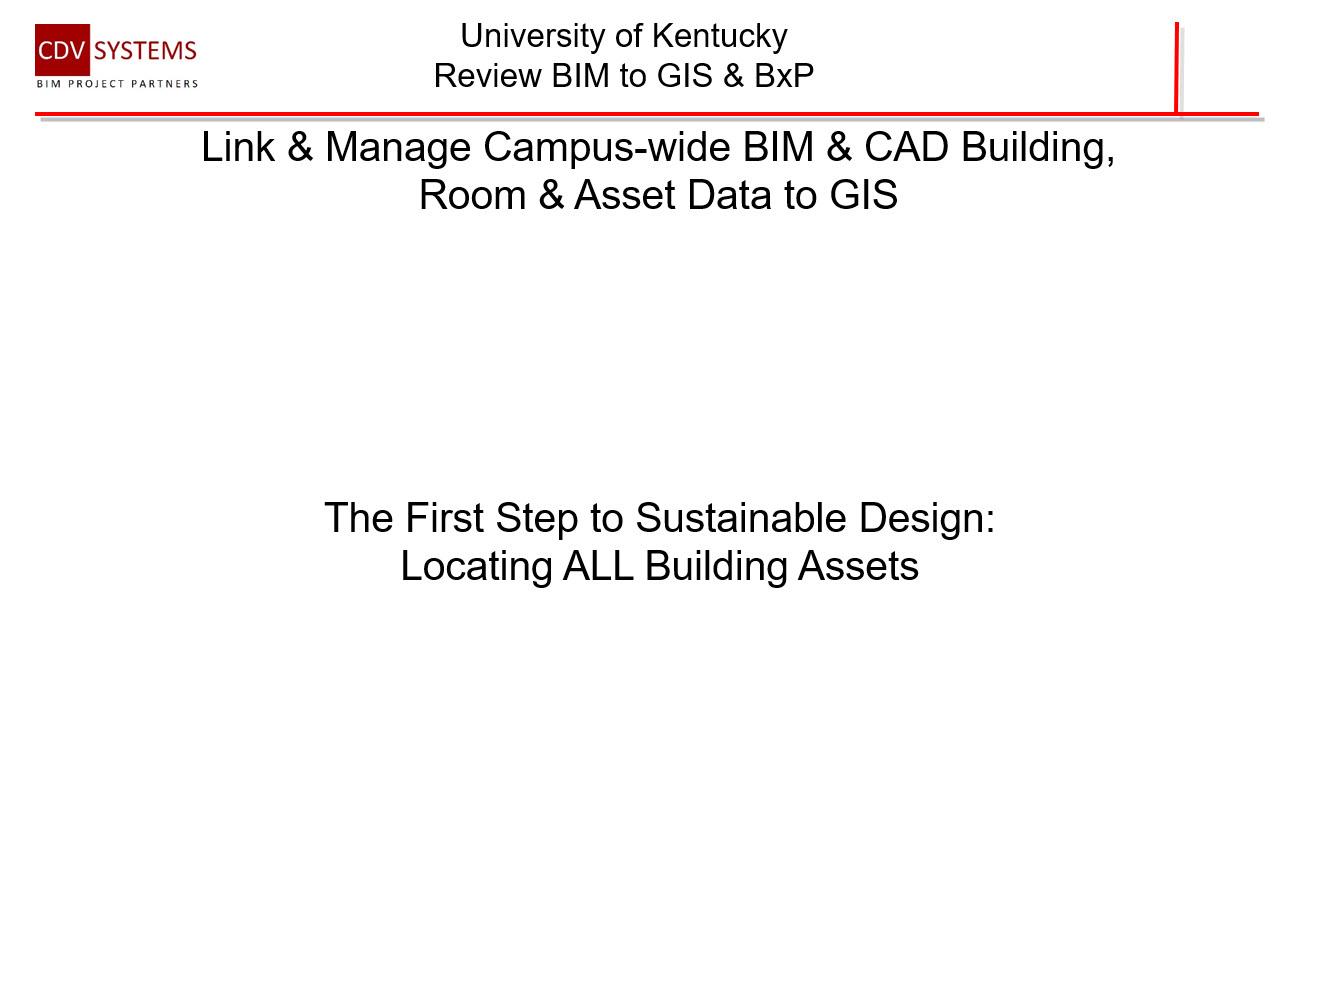 University of Kentucky_004.jpg